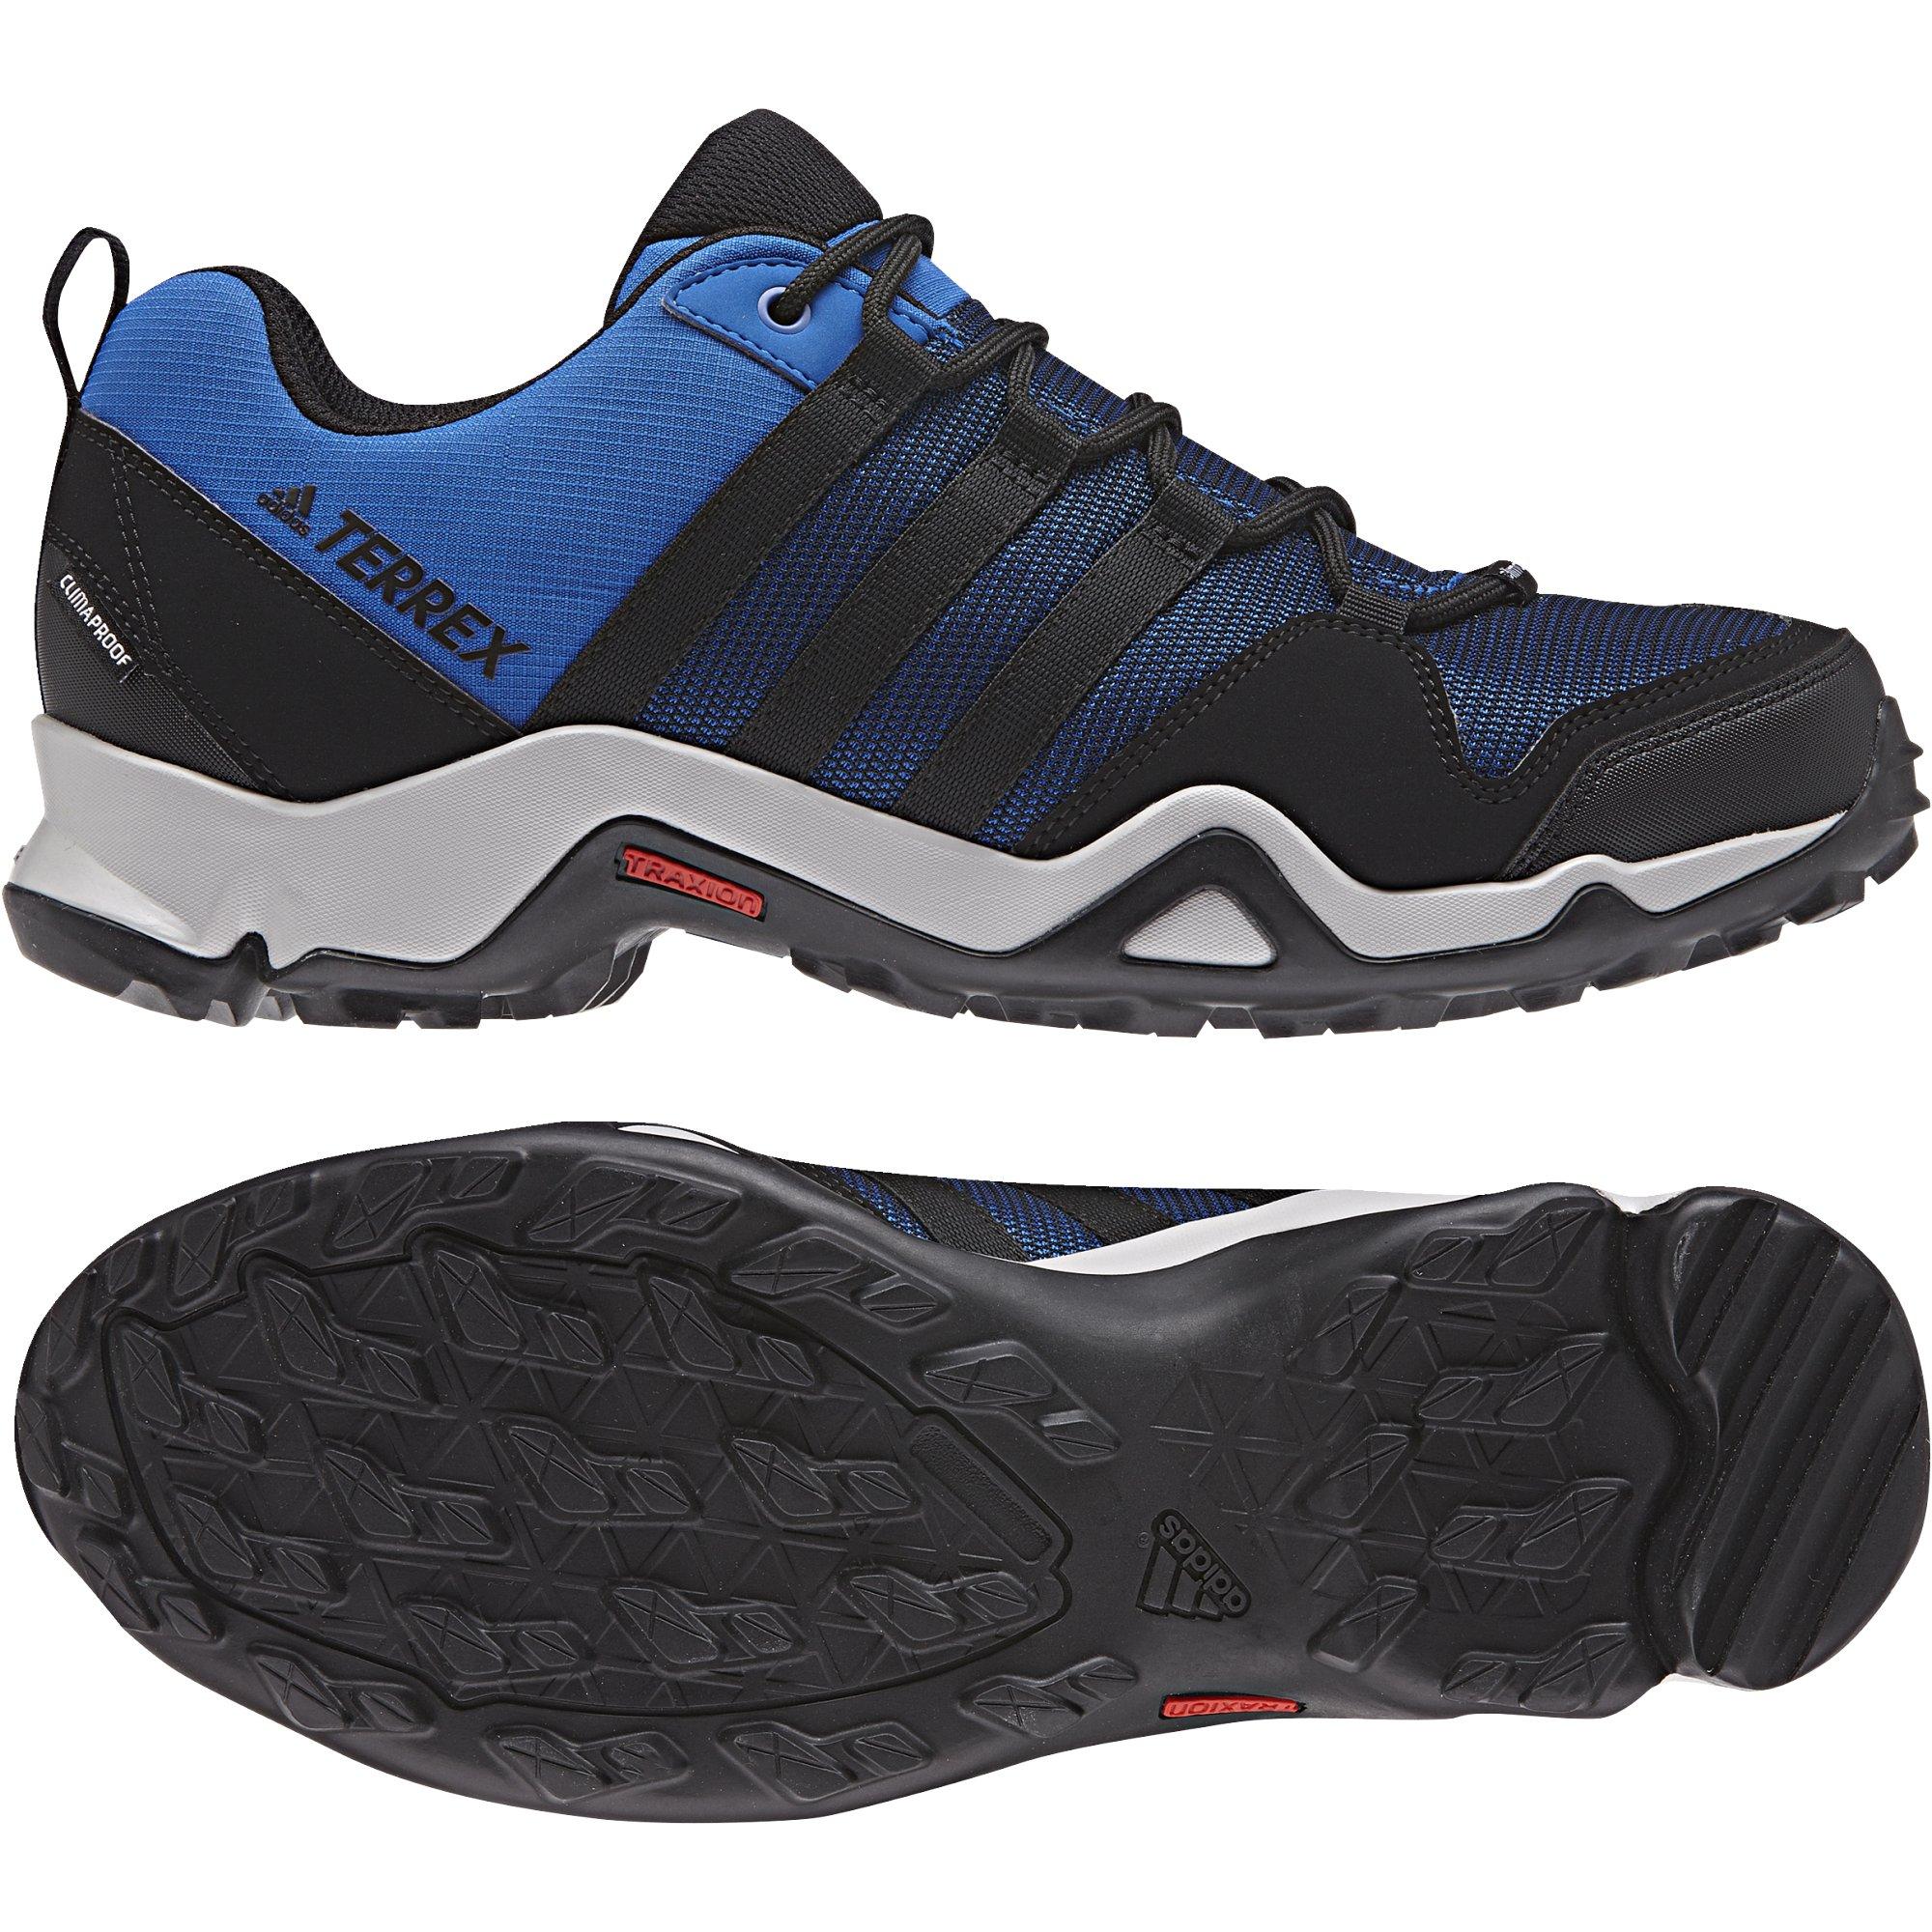 Salomon buty trekingowe adidasy 35,5 jak NOWE Bielsko Biała